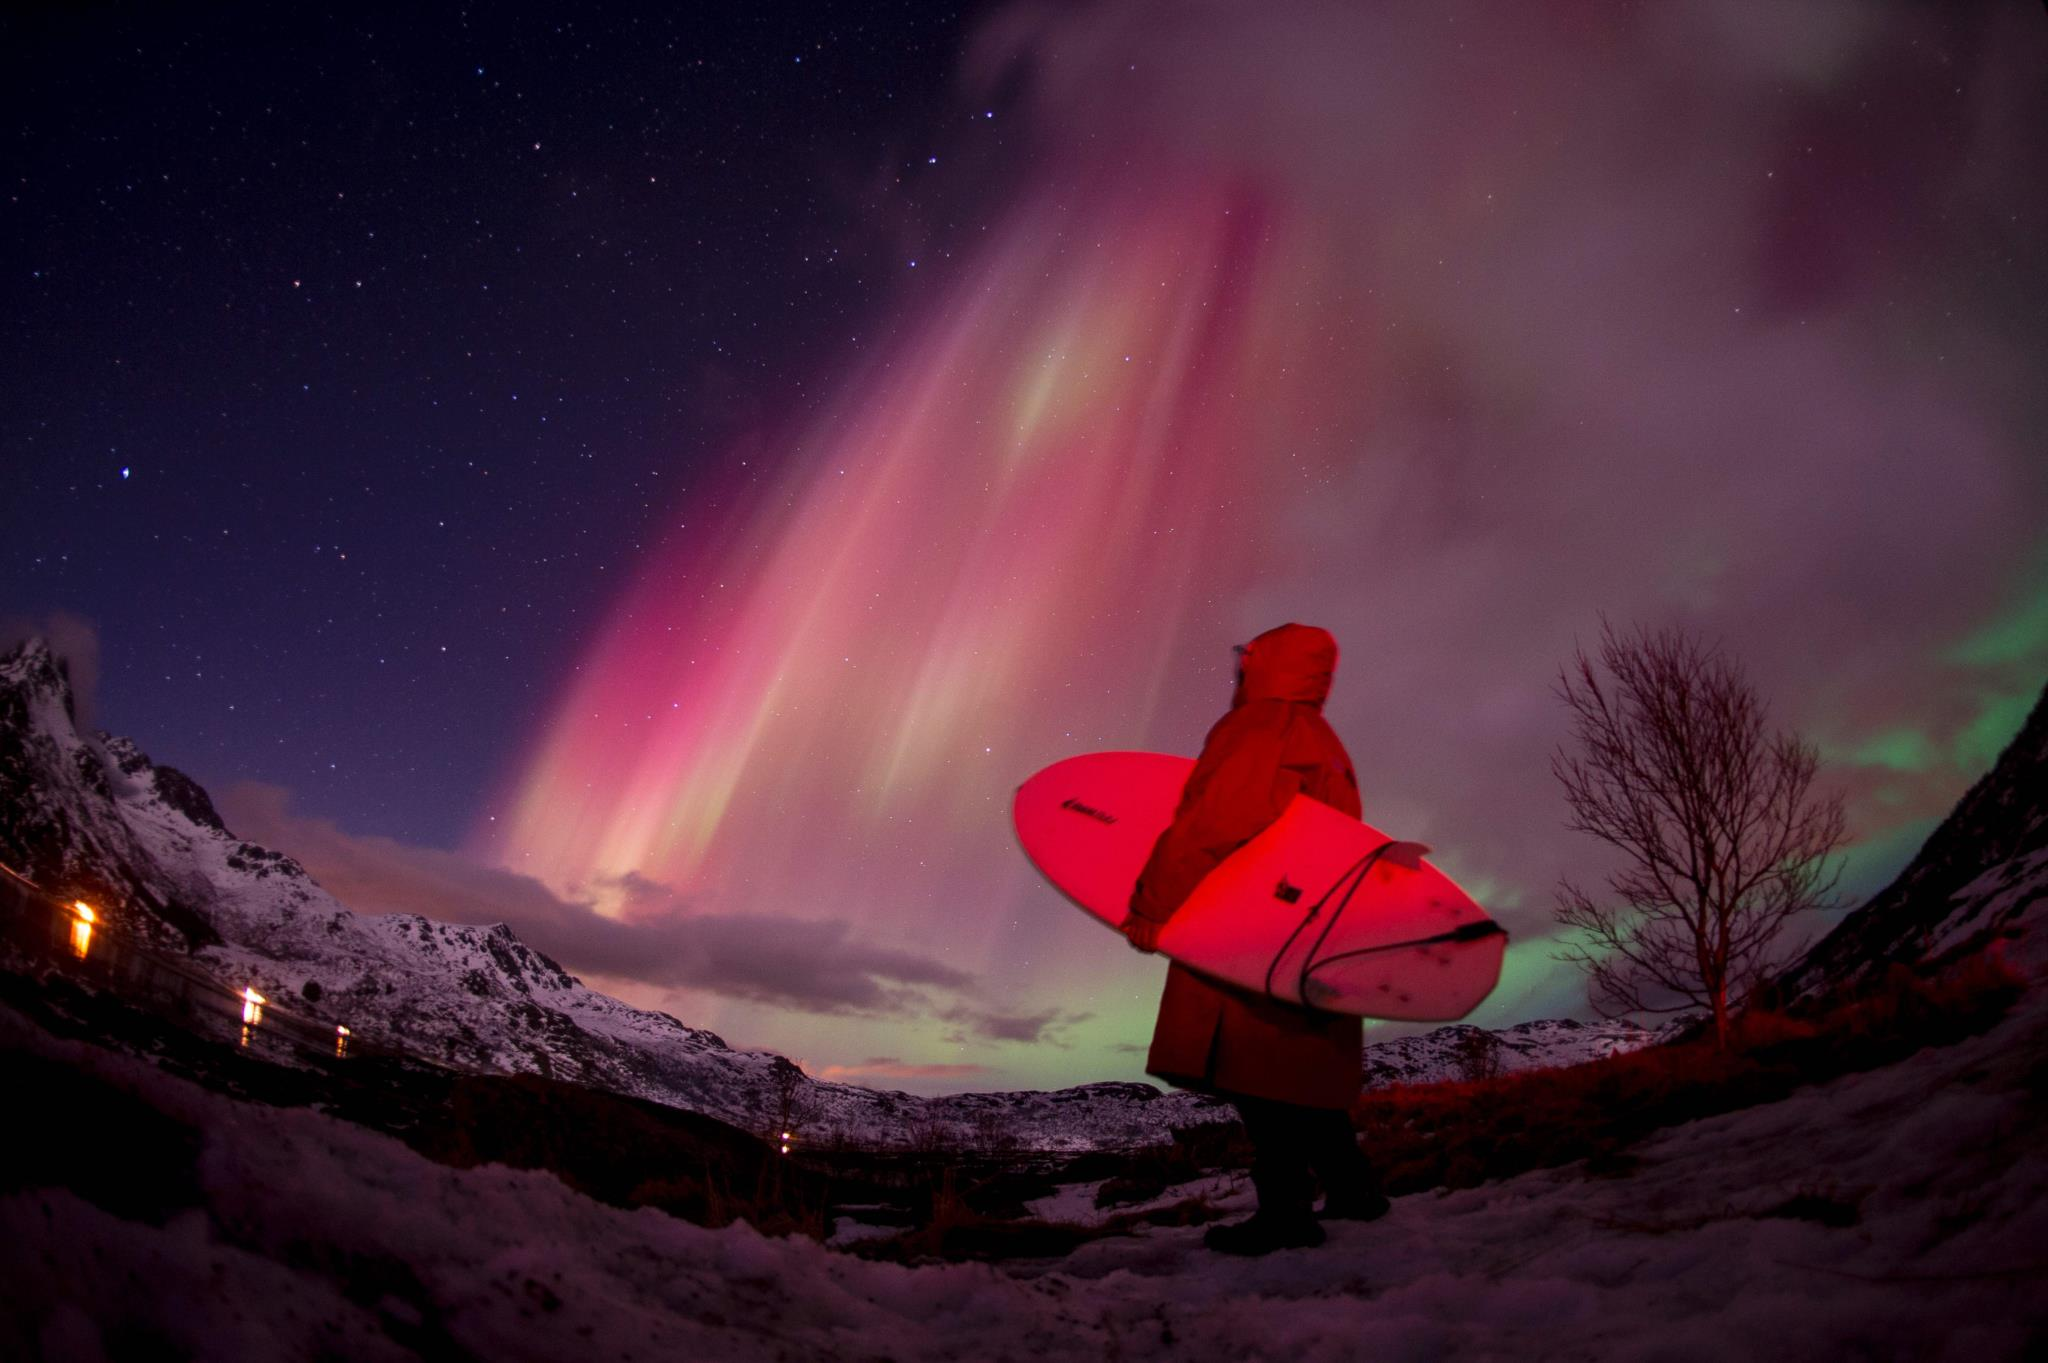 Um surfista observa as luzes da aurora boreal no arquipélago Lofoten, no Círculo Polar Árctico